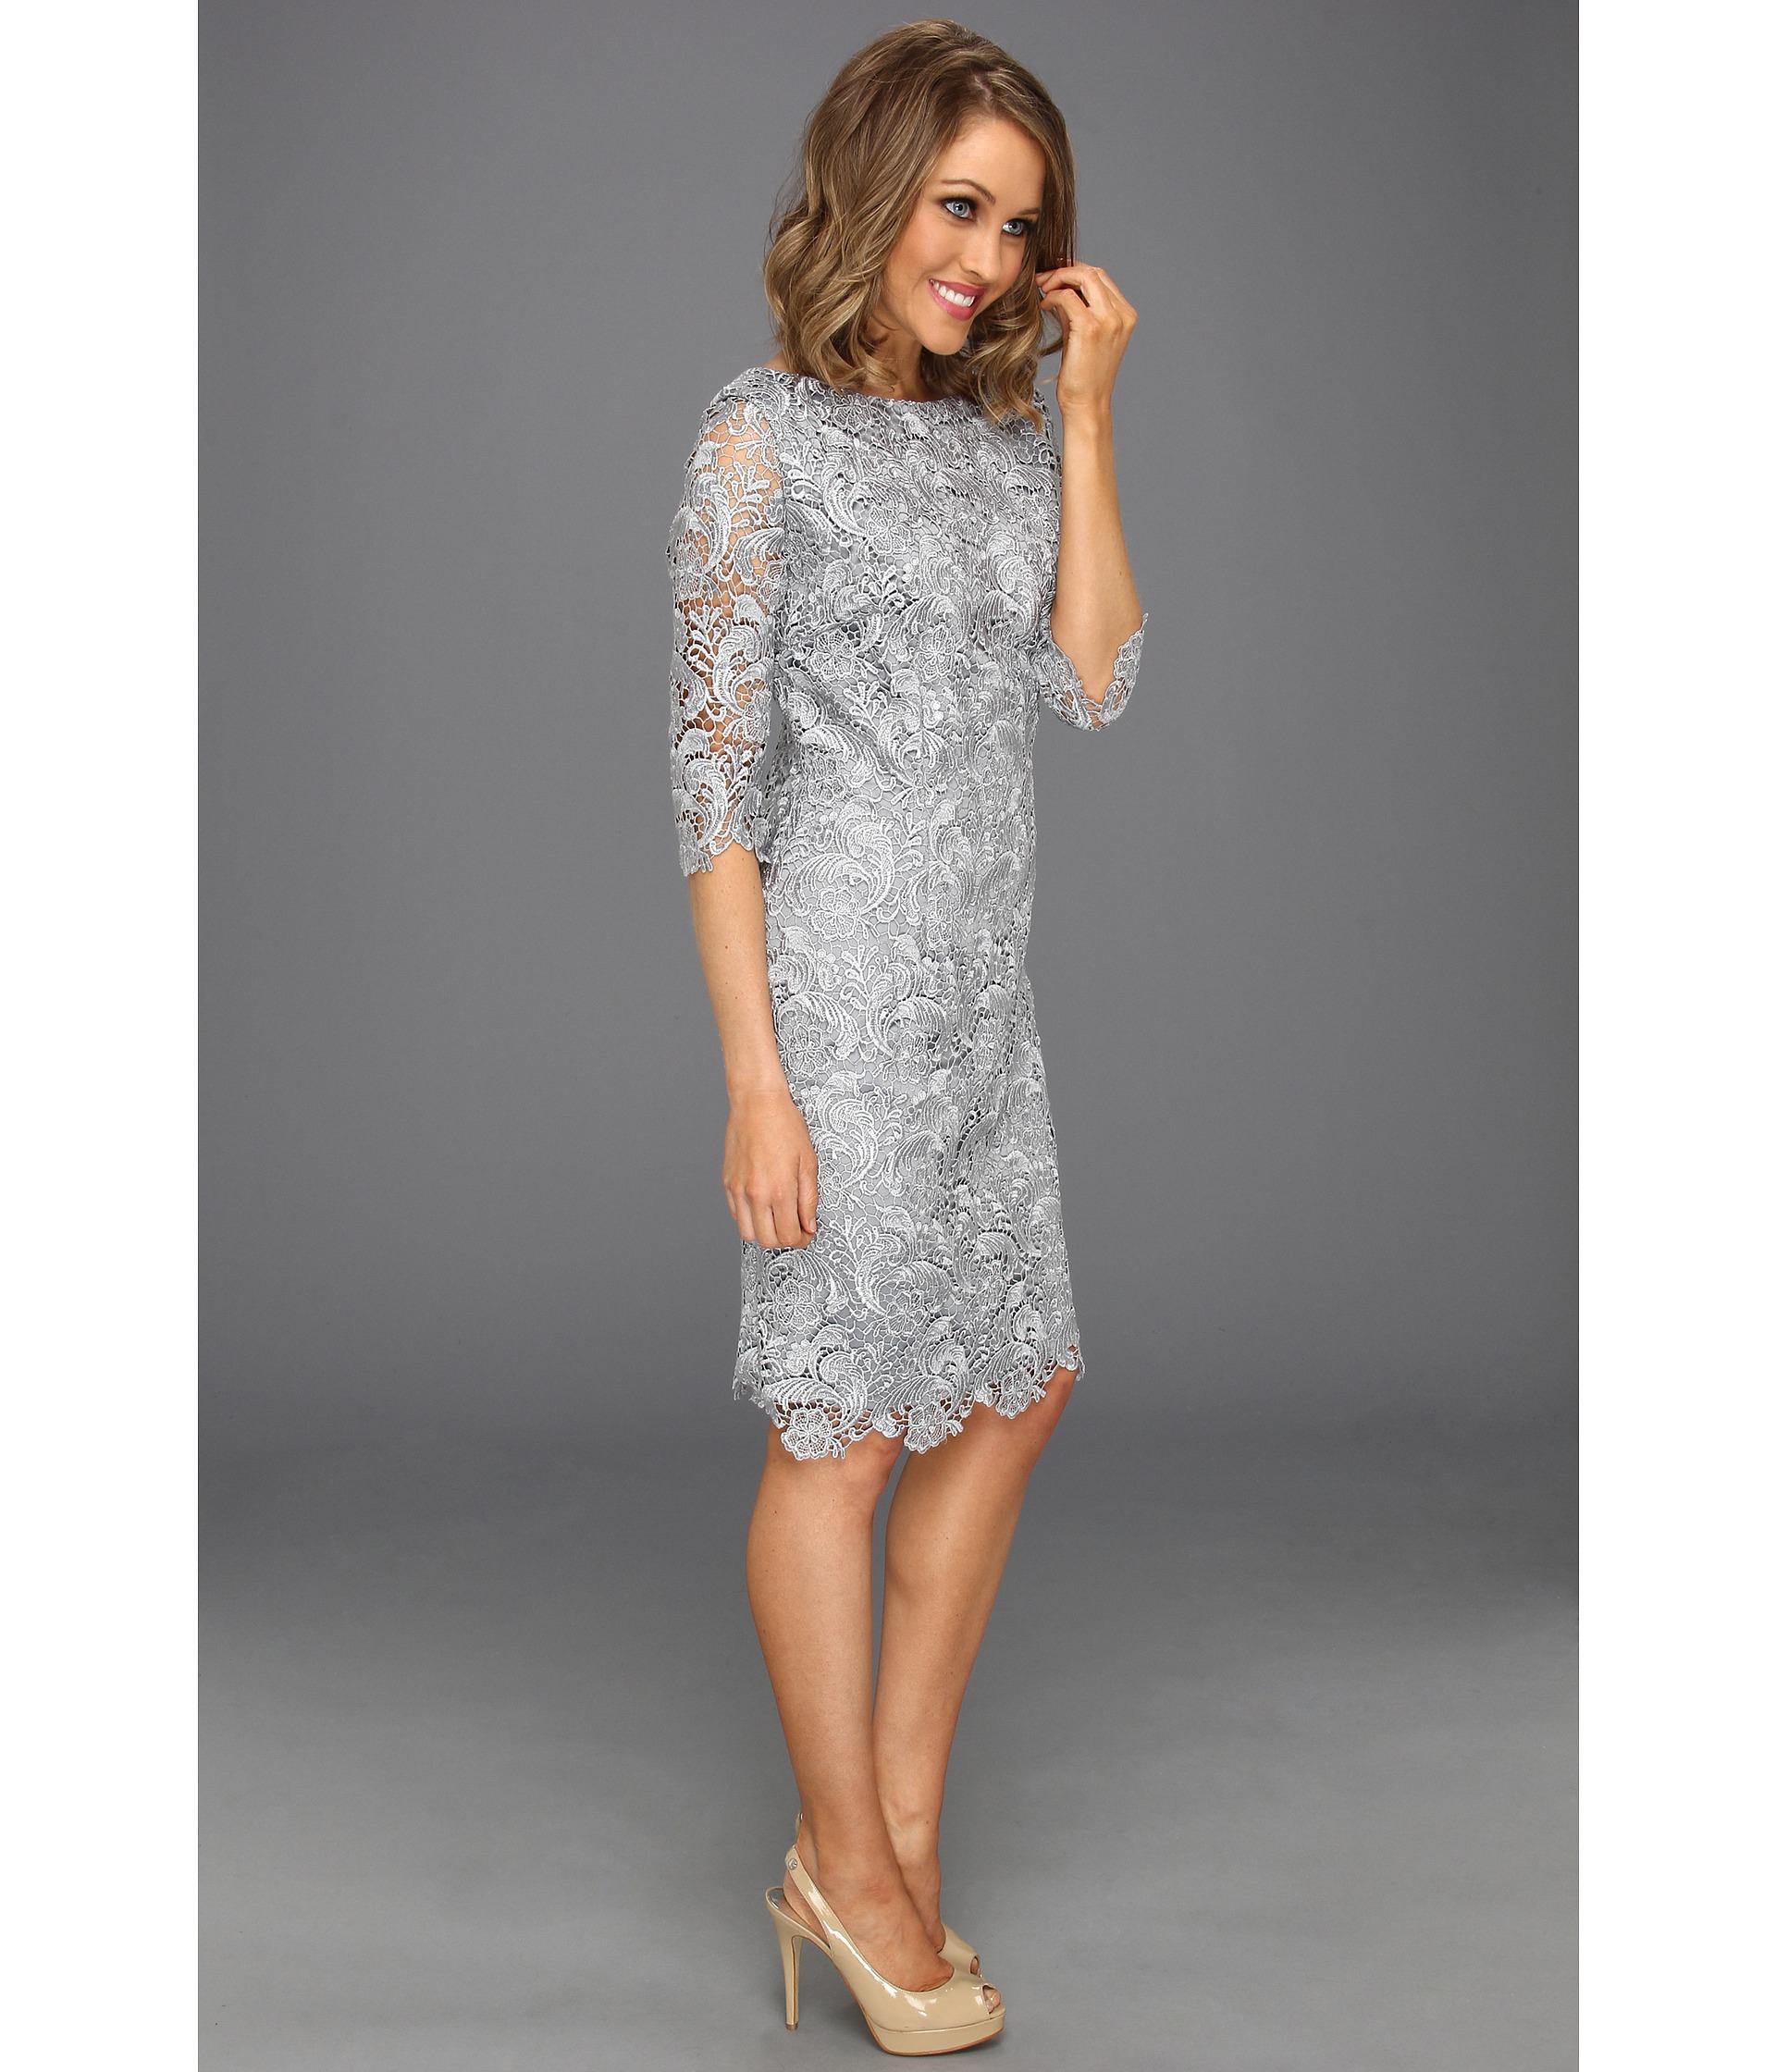 Eliza J Dress - Photo Dress Wallpaper HD AOrg